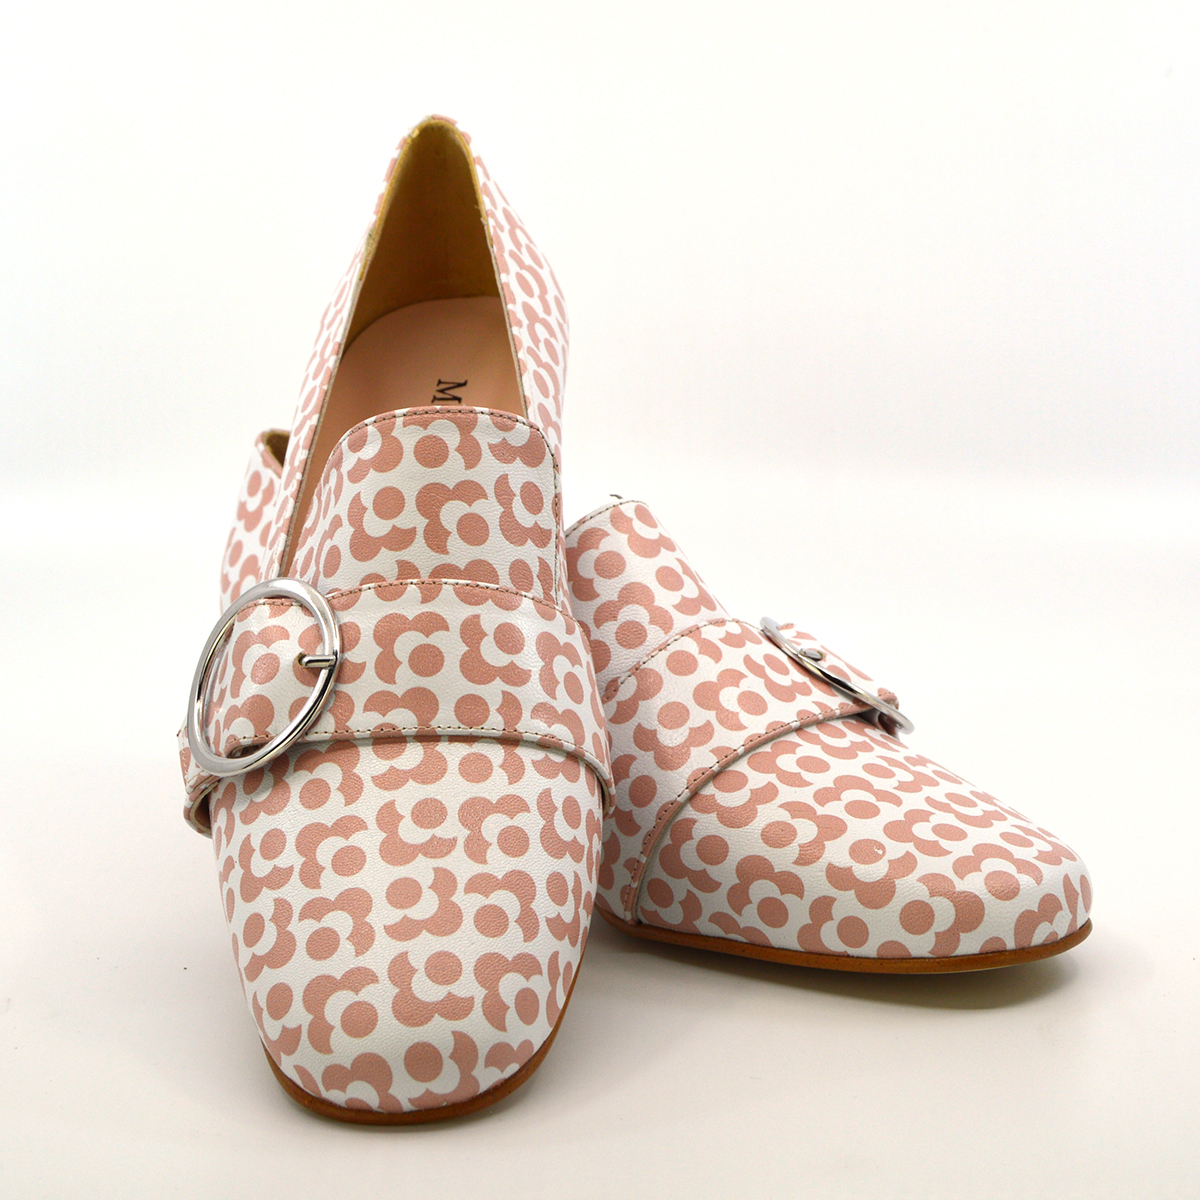 9c604c4143b The Marsha In Pink Geometric Flower Pattern – Mod Ladies Buckle ...